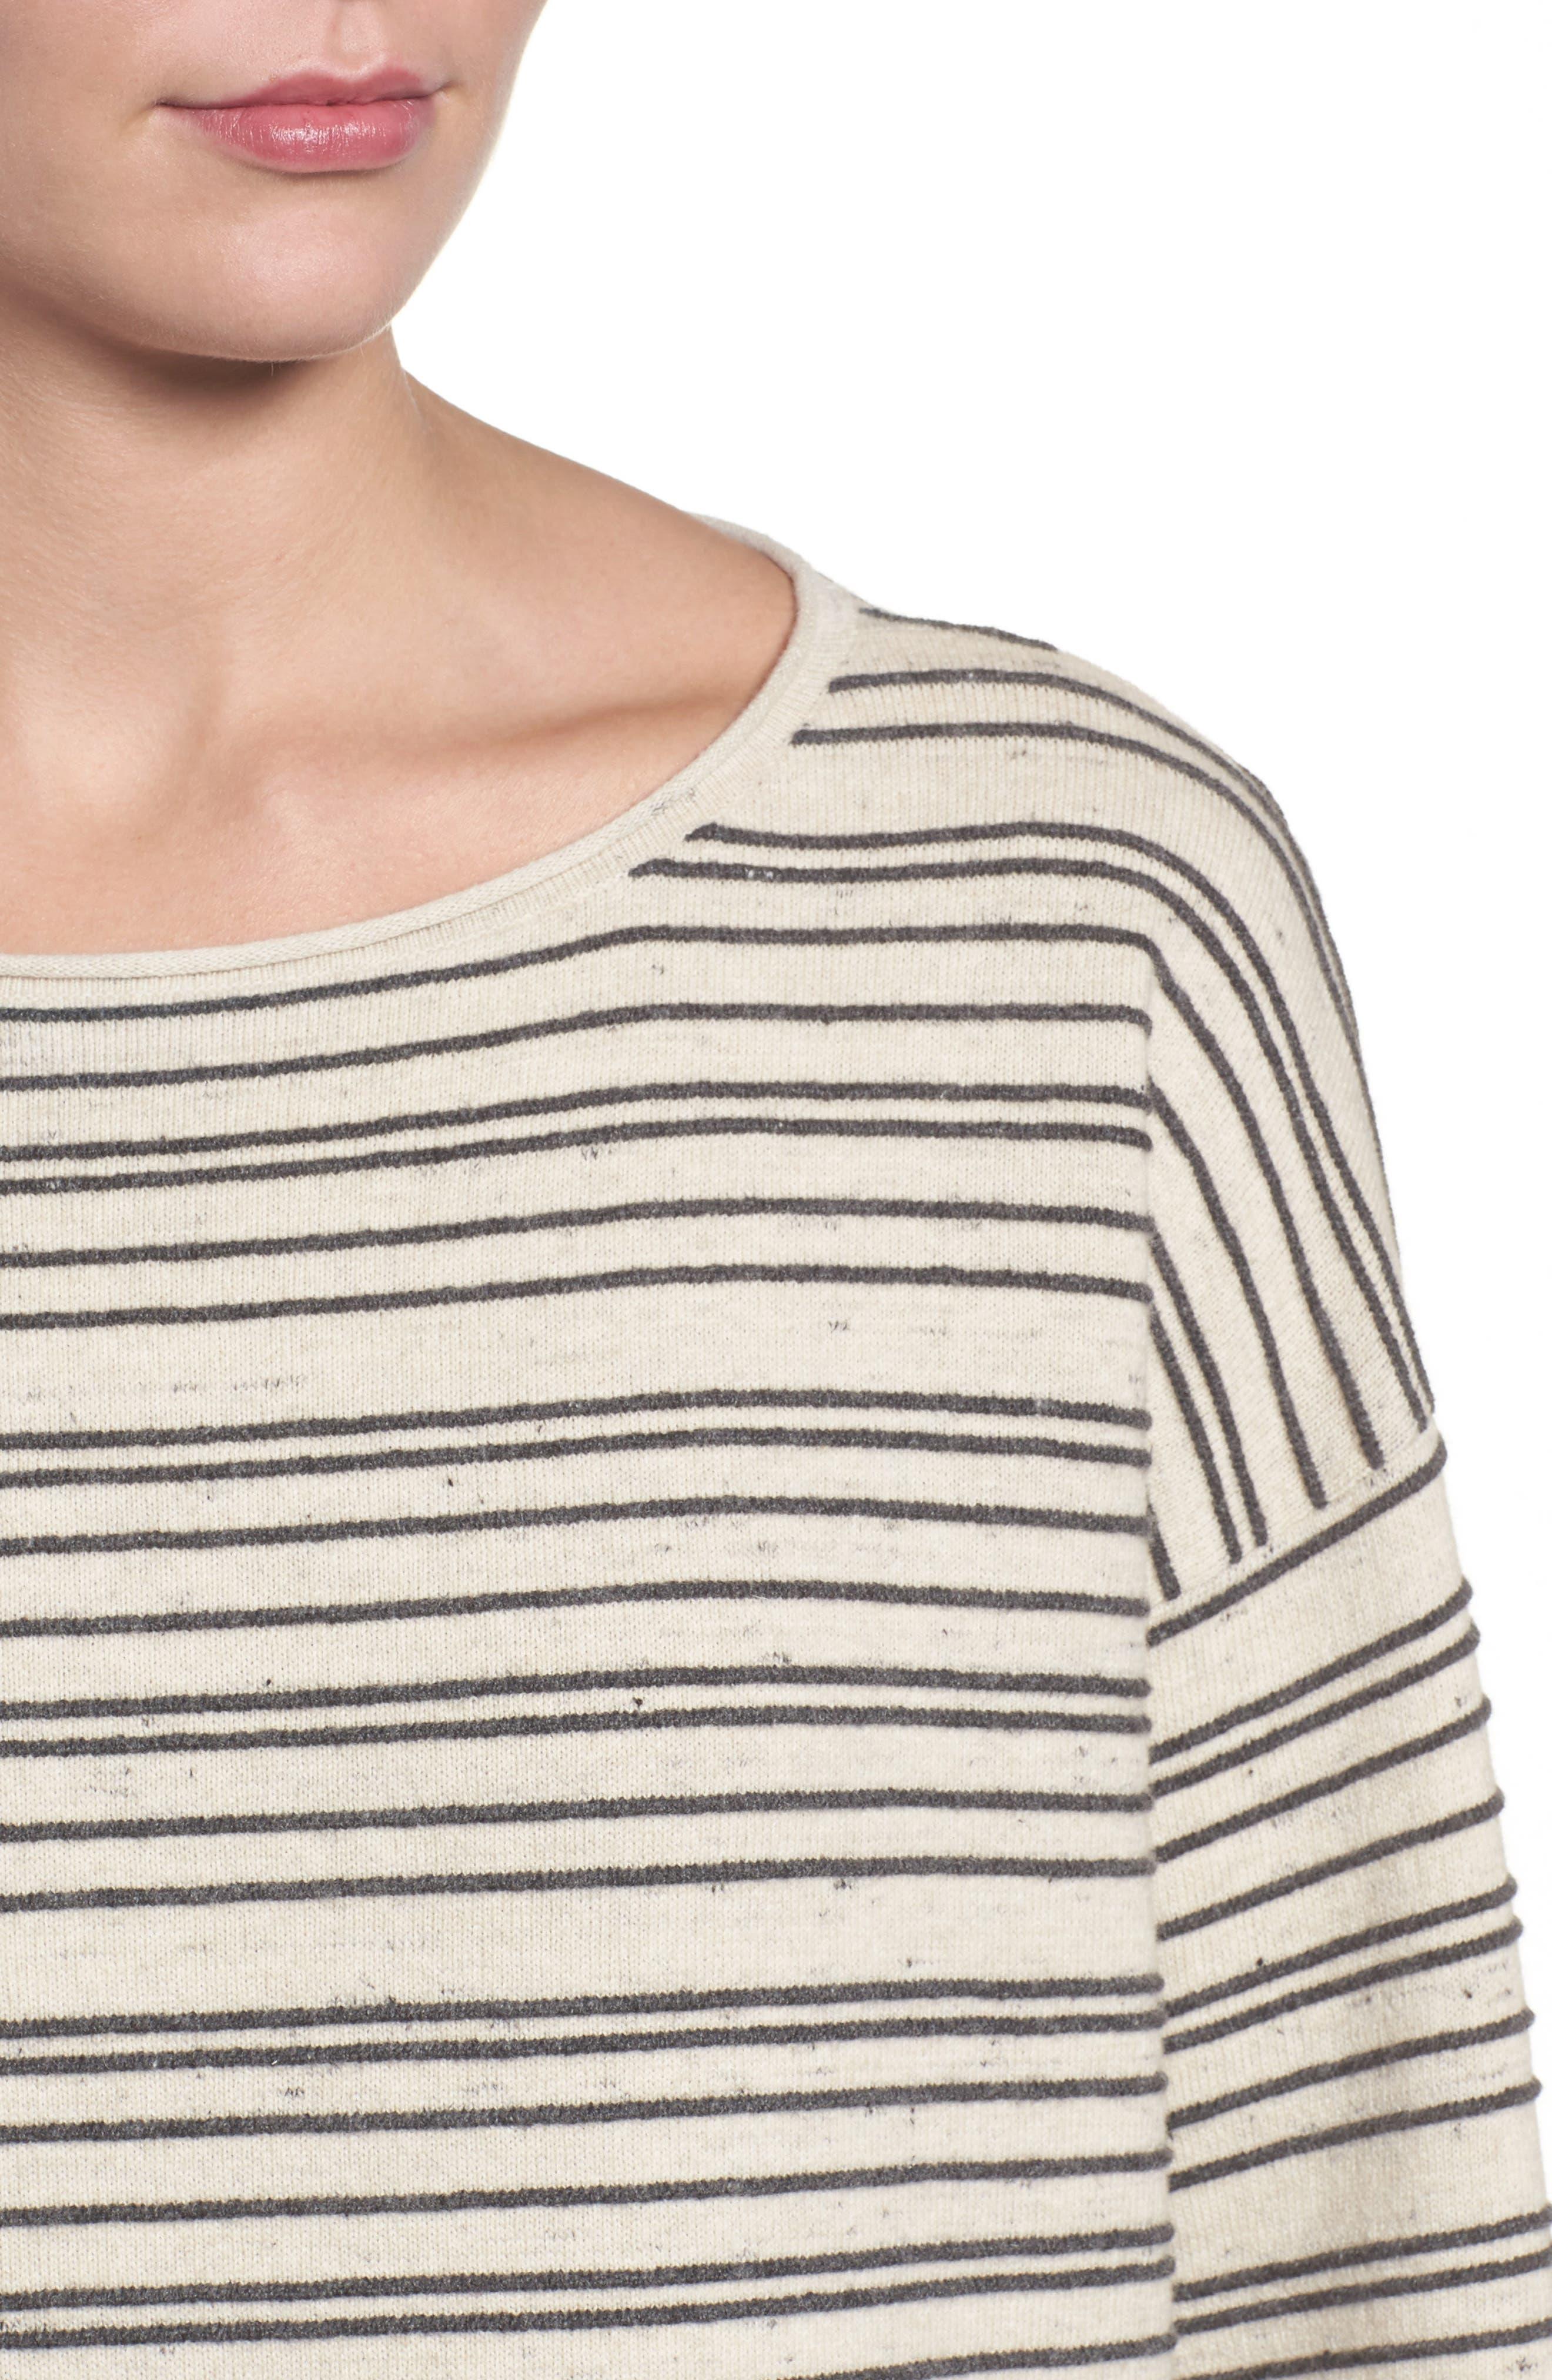 Stripe Organic Cotton Blend Sweater,                             Alternate thumbnail 4, color,                             264